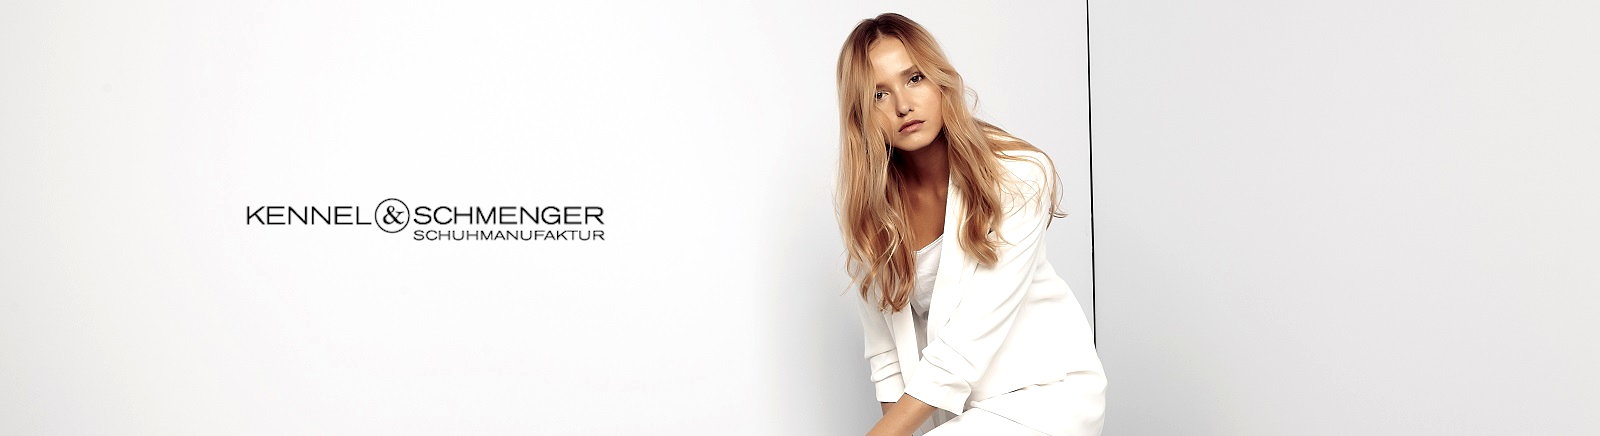 Gisy: Kennel & Schmenger Plateau-Stiefeletten für Damen online shoppen